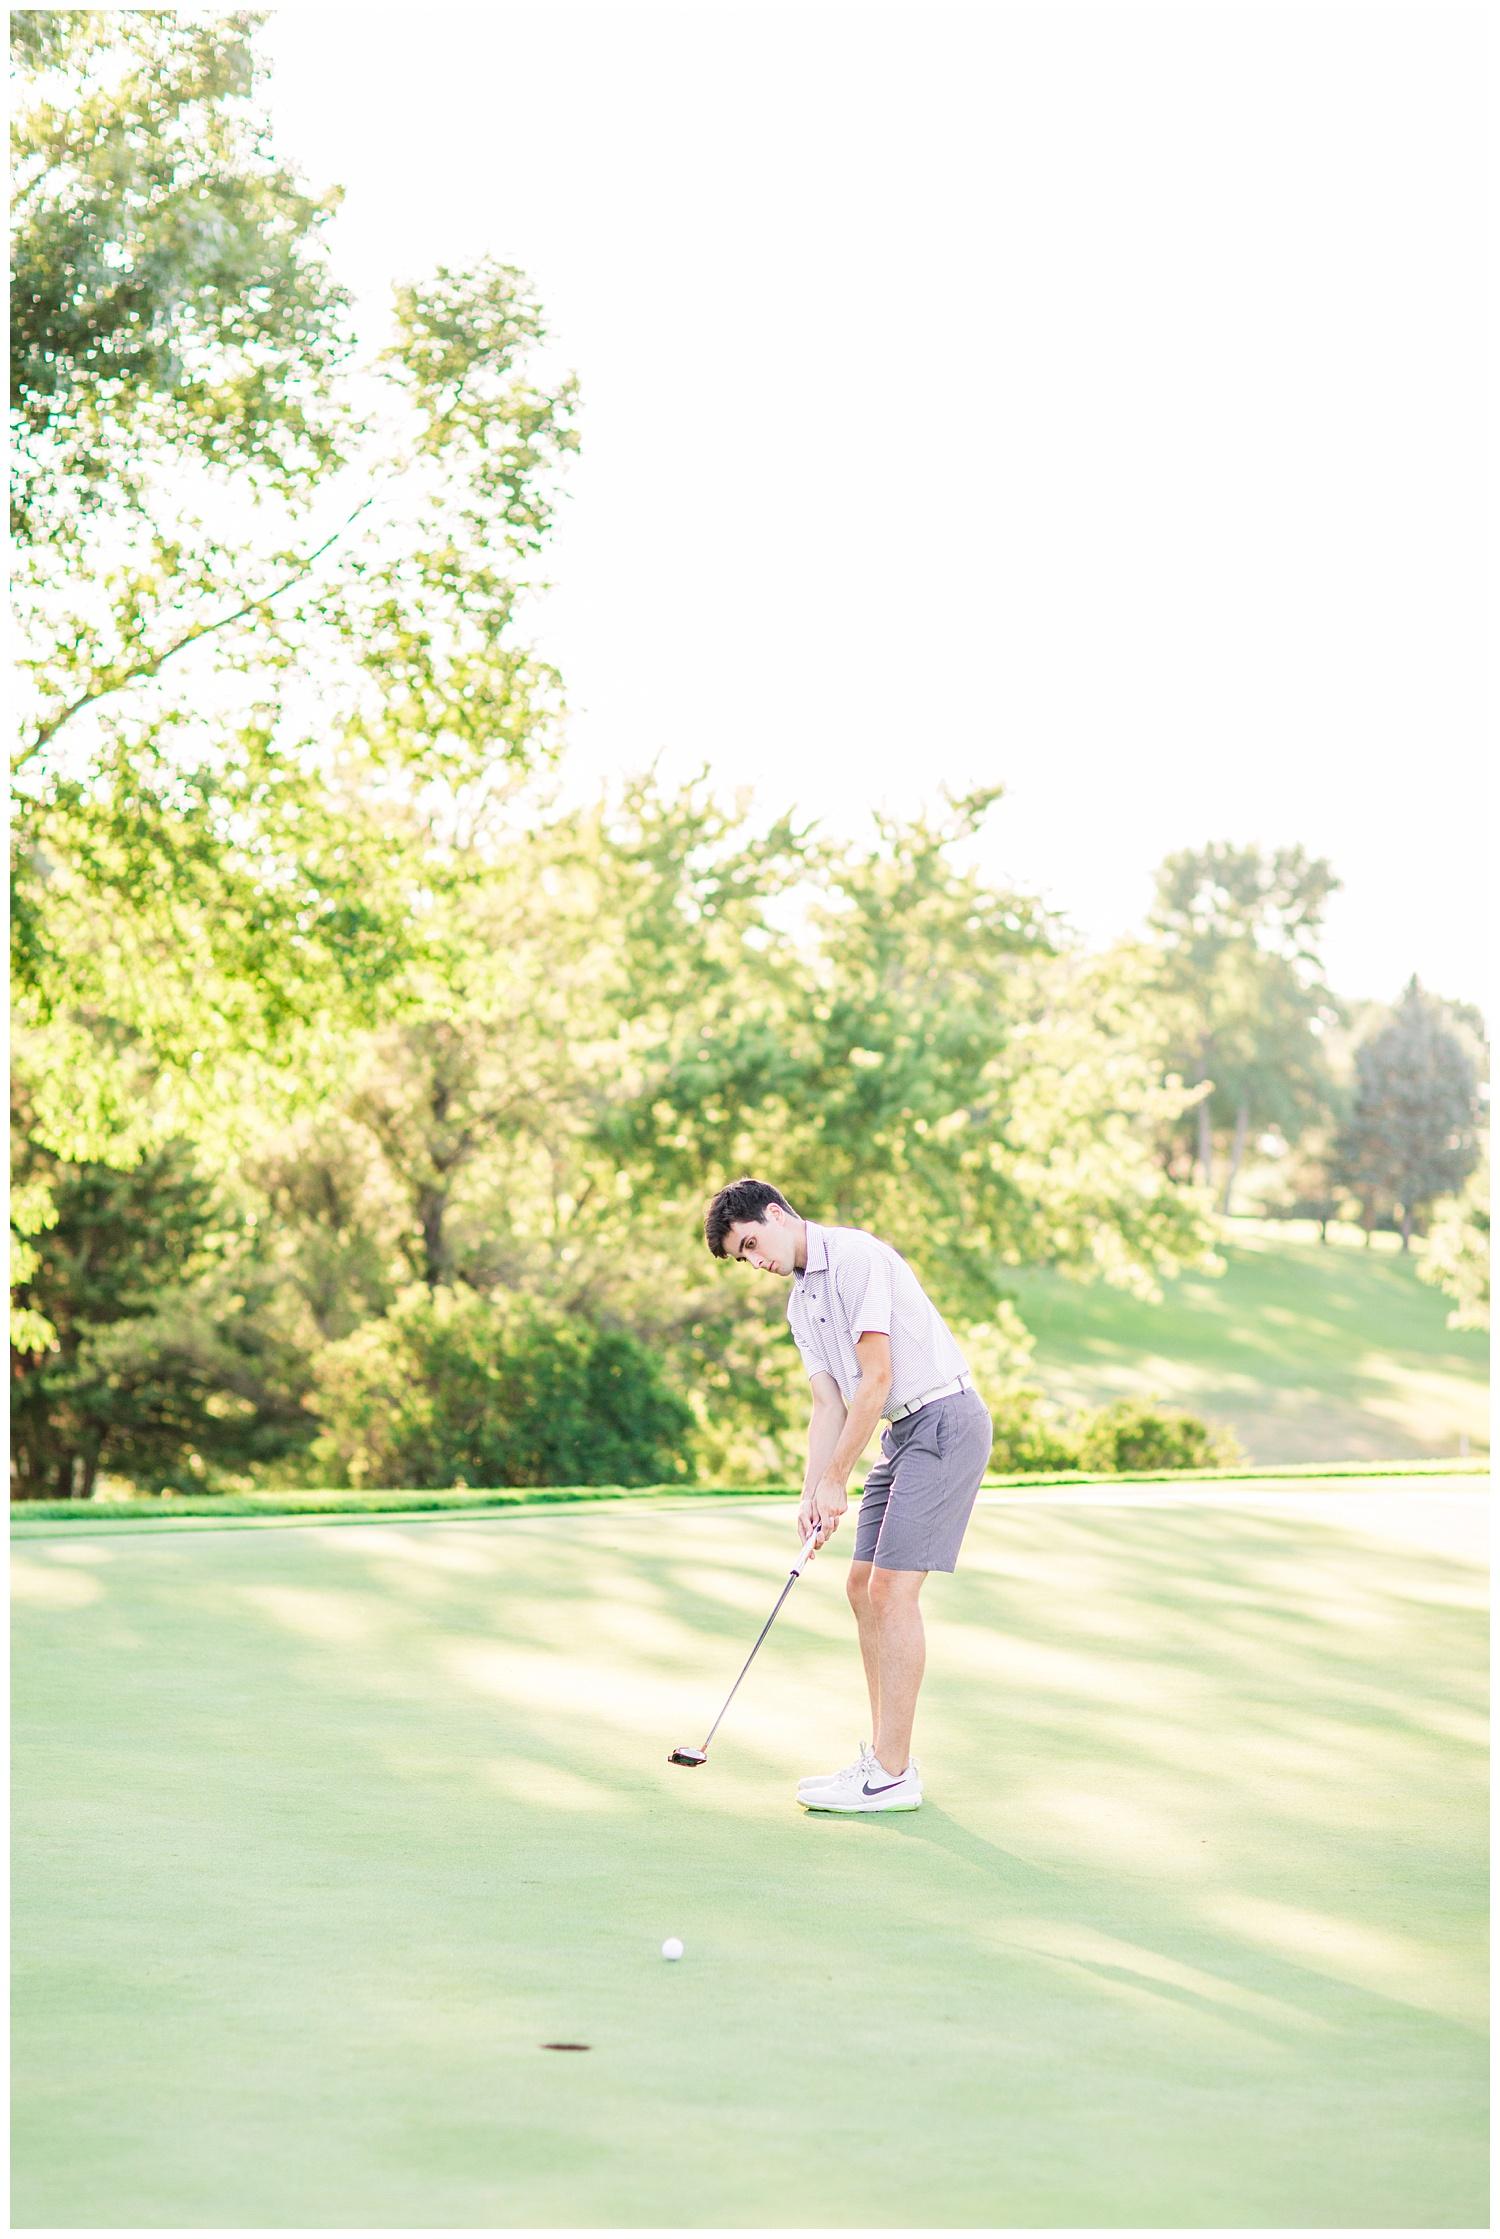 High school senior boy putting a golf ball at Spring Vally Golf Course in Livermore, Iowa | CB Studio